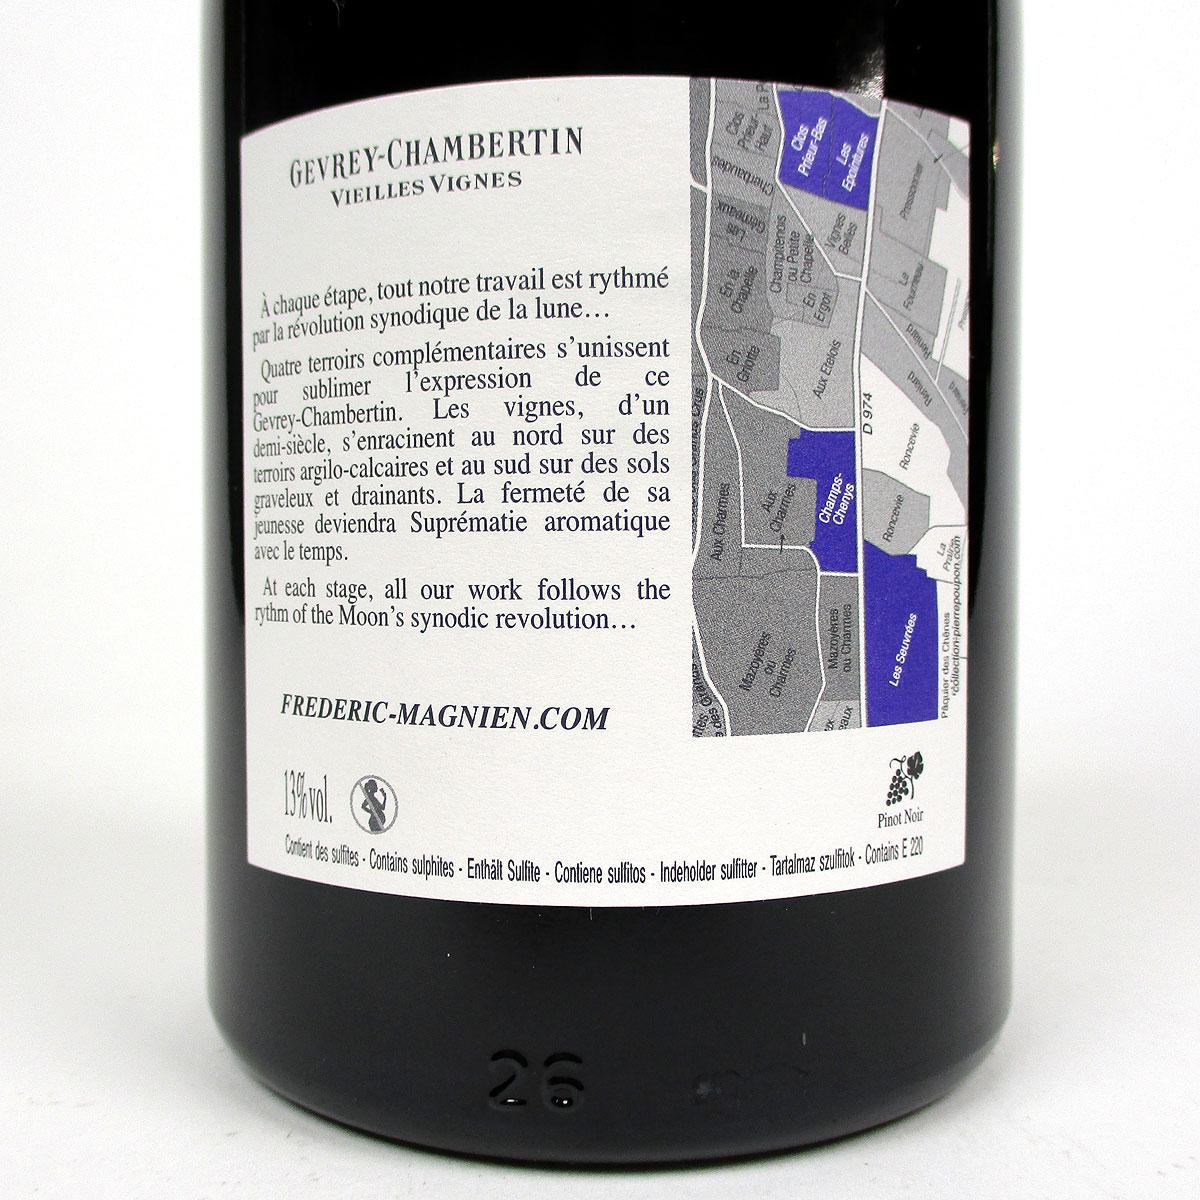 Gevrey-Chambertin: Frédéric Magnien 'Vieilles Vignes' 2017 - Rear Label